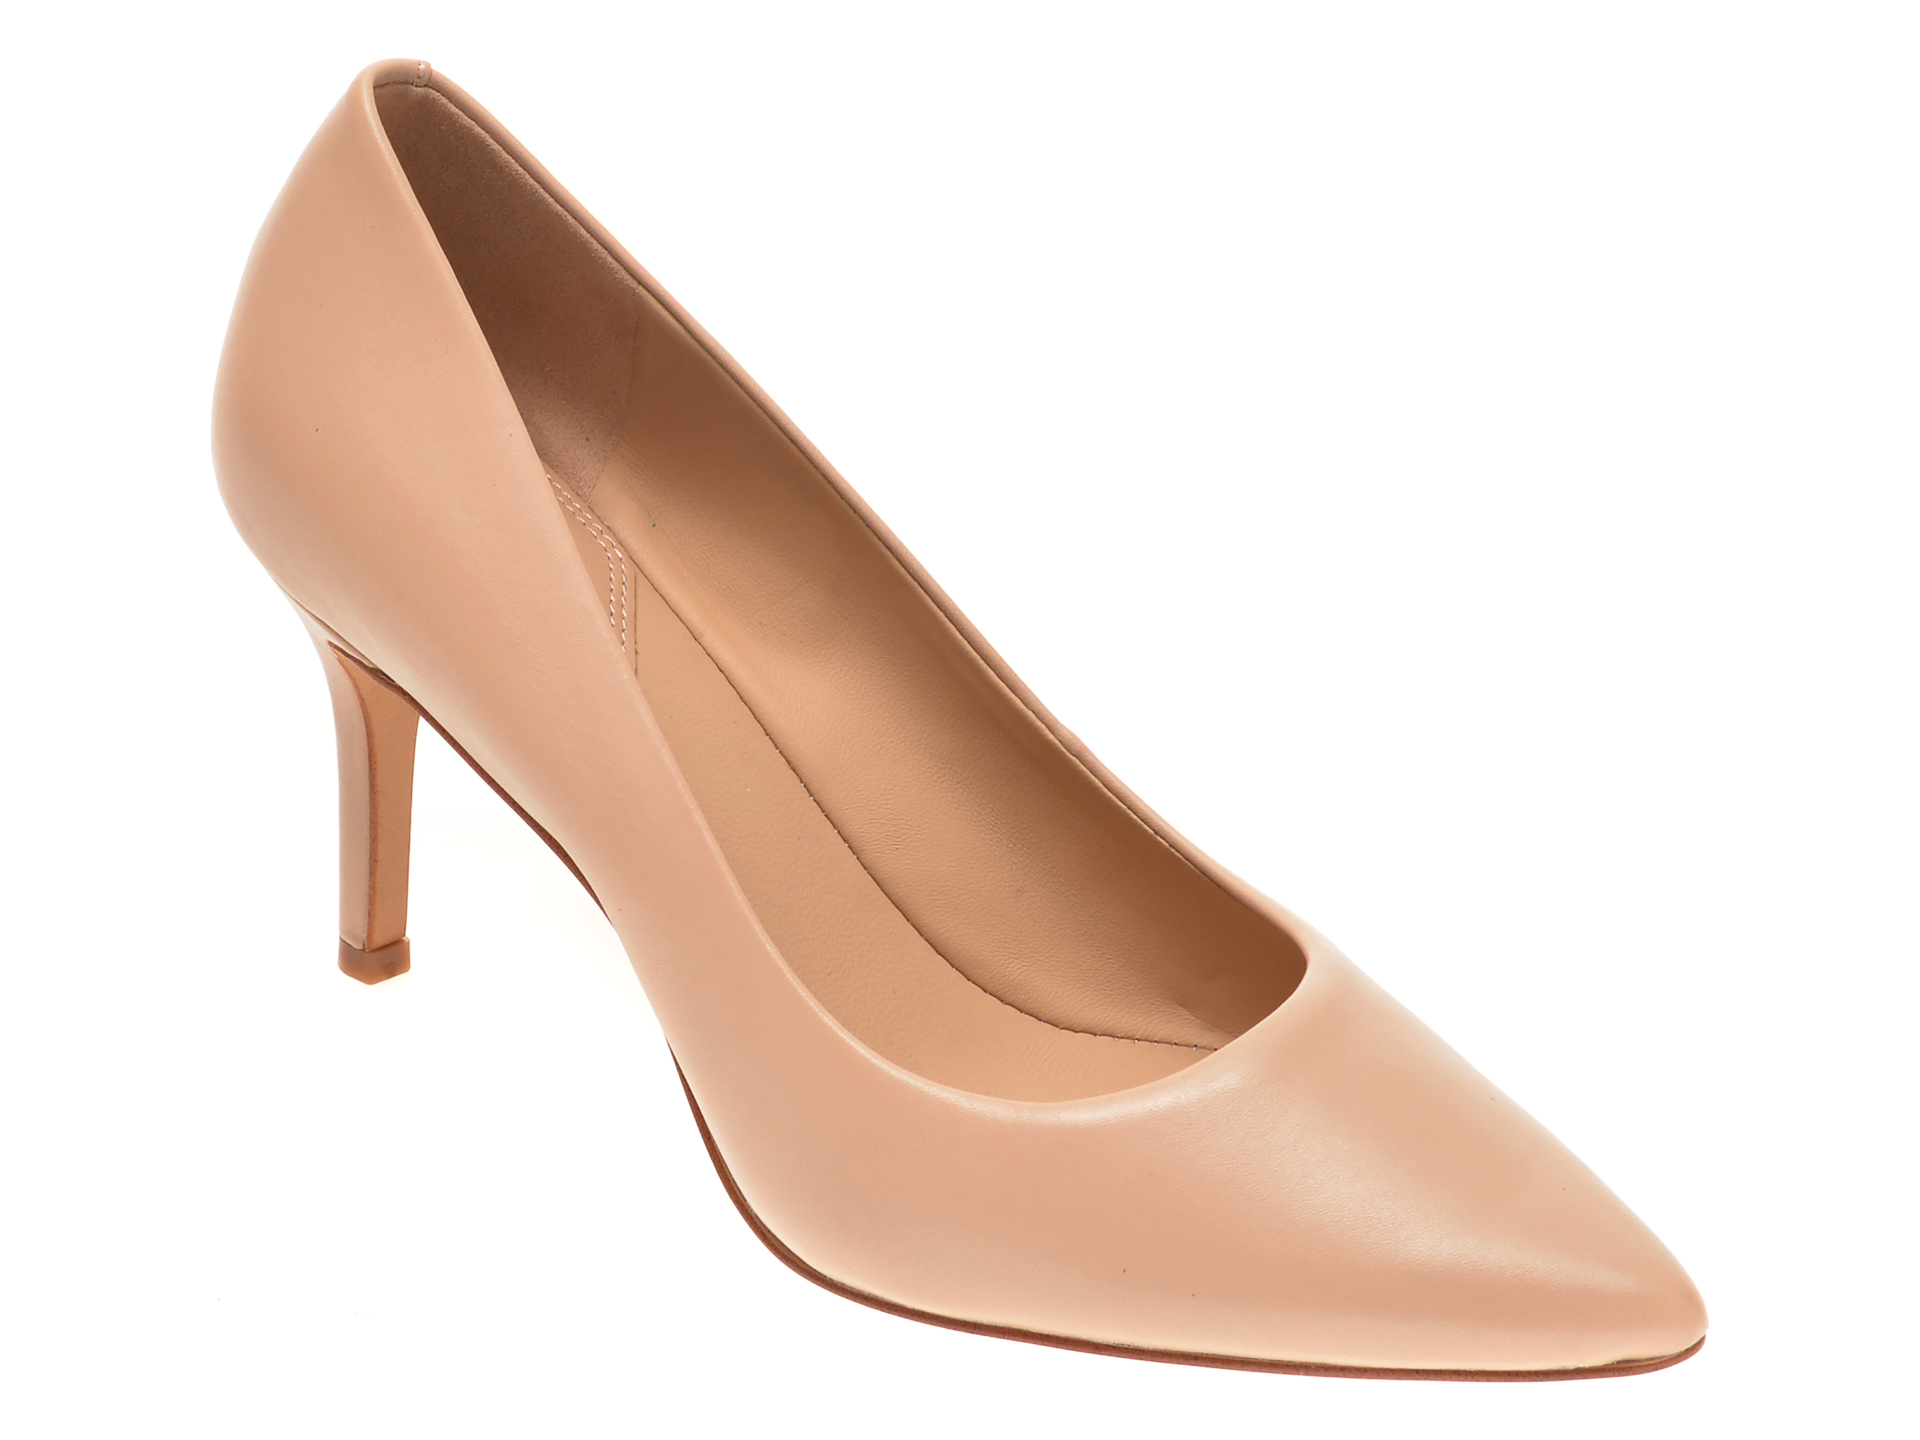 Pantofi ALDO bej, Coronitiflex270, din piele naturala imagine otter.ro